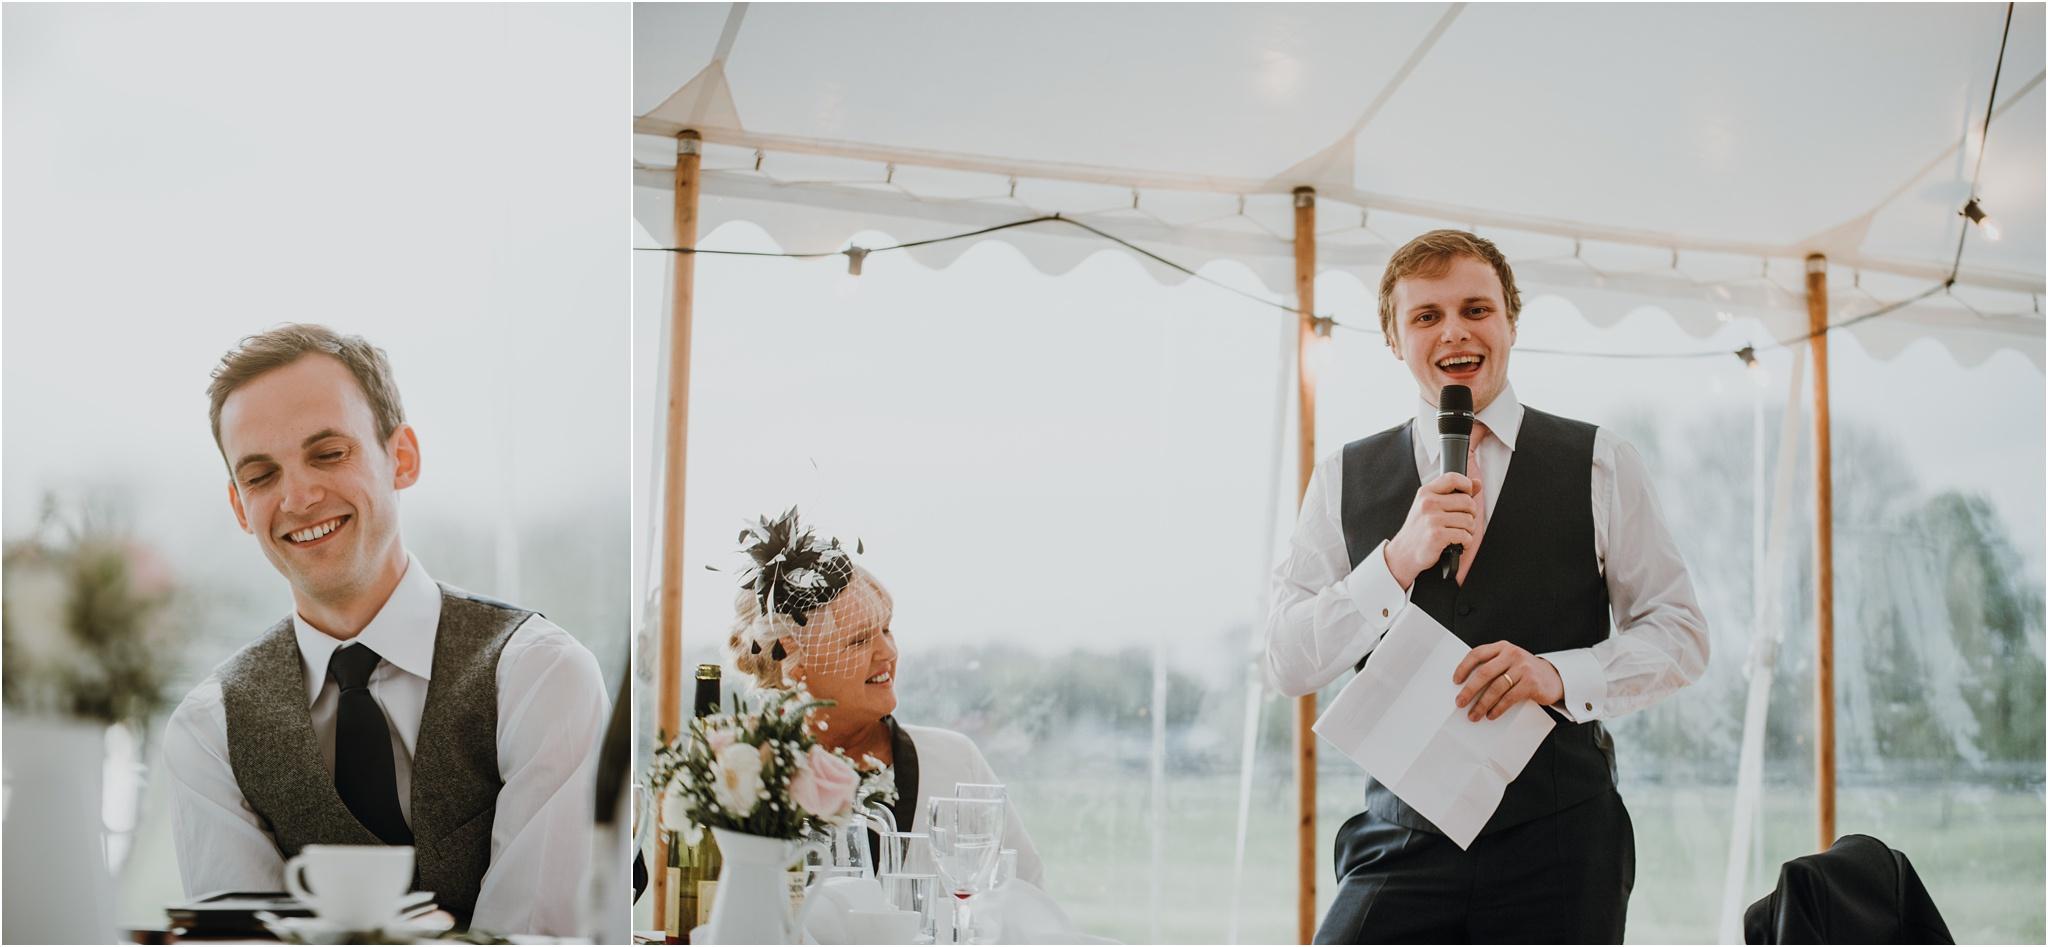 Outdoor-country-wedding-Edinburgh-photographer__0133.jpg